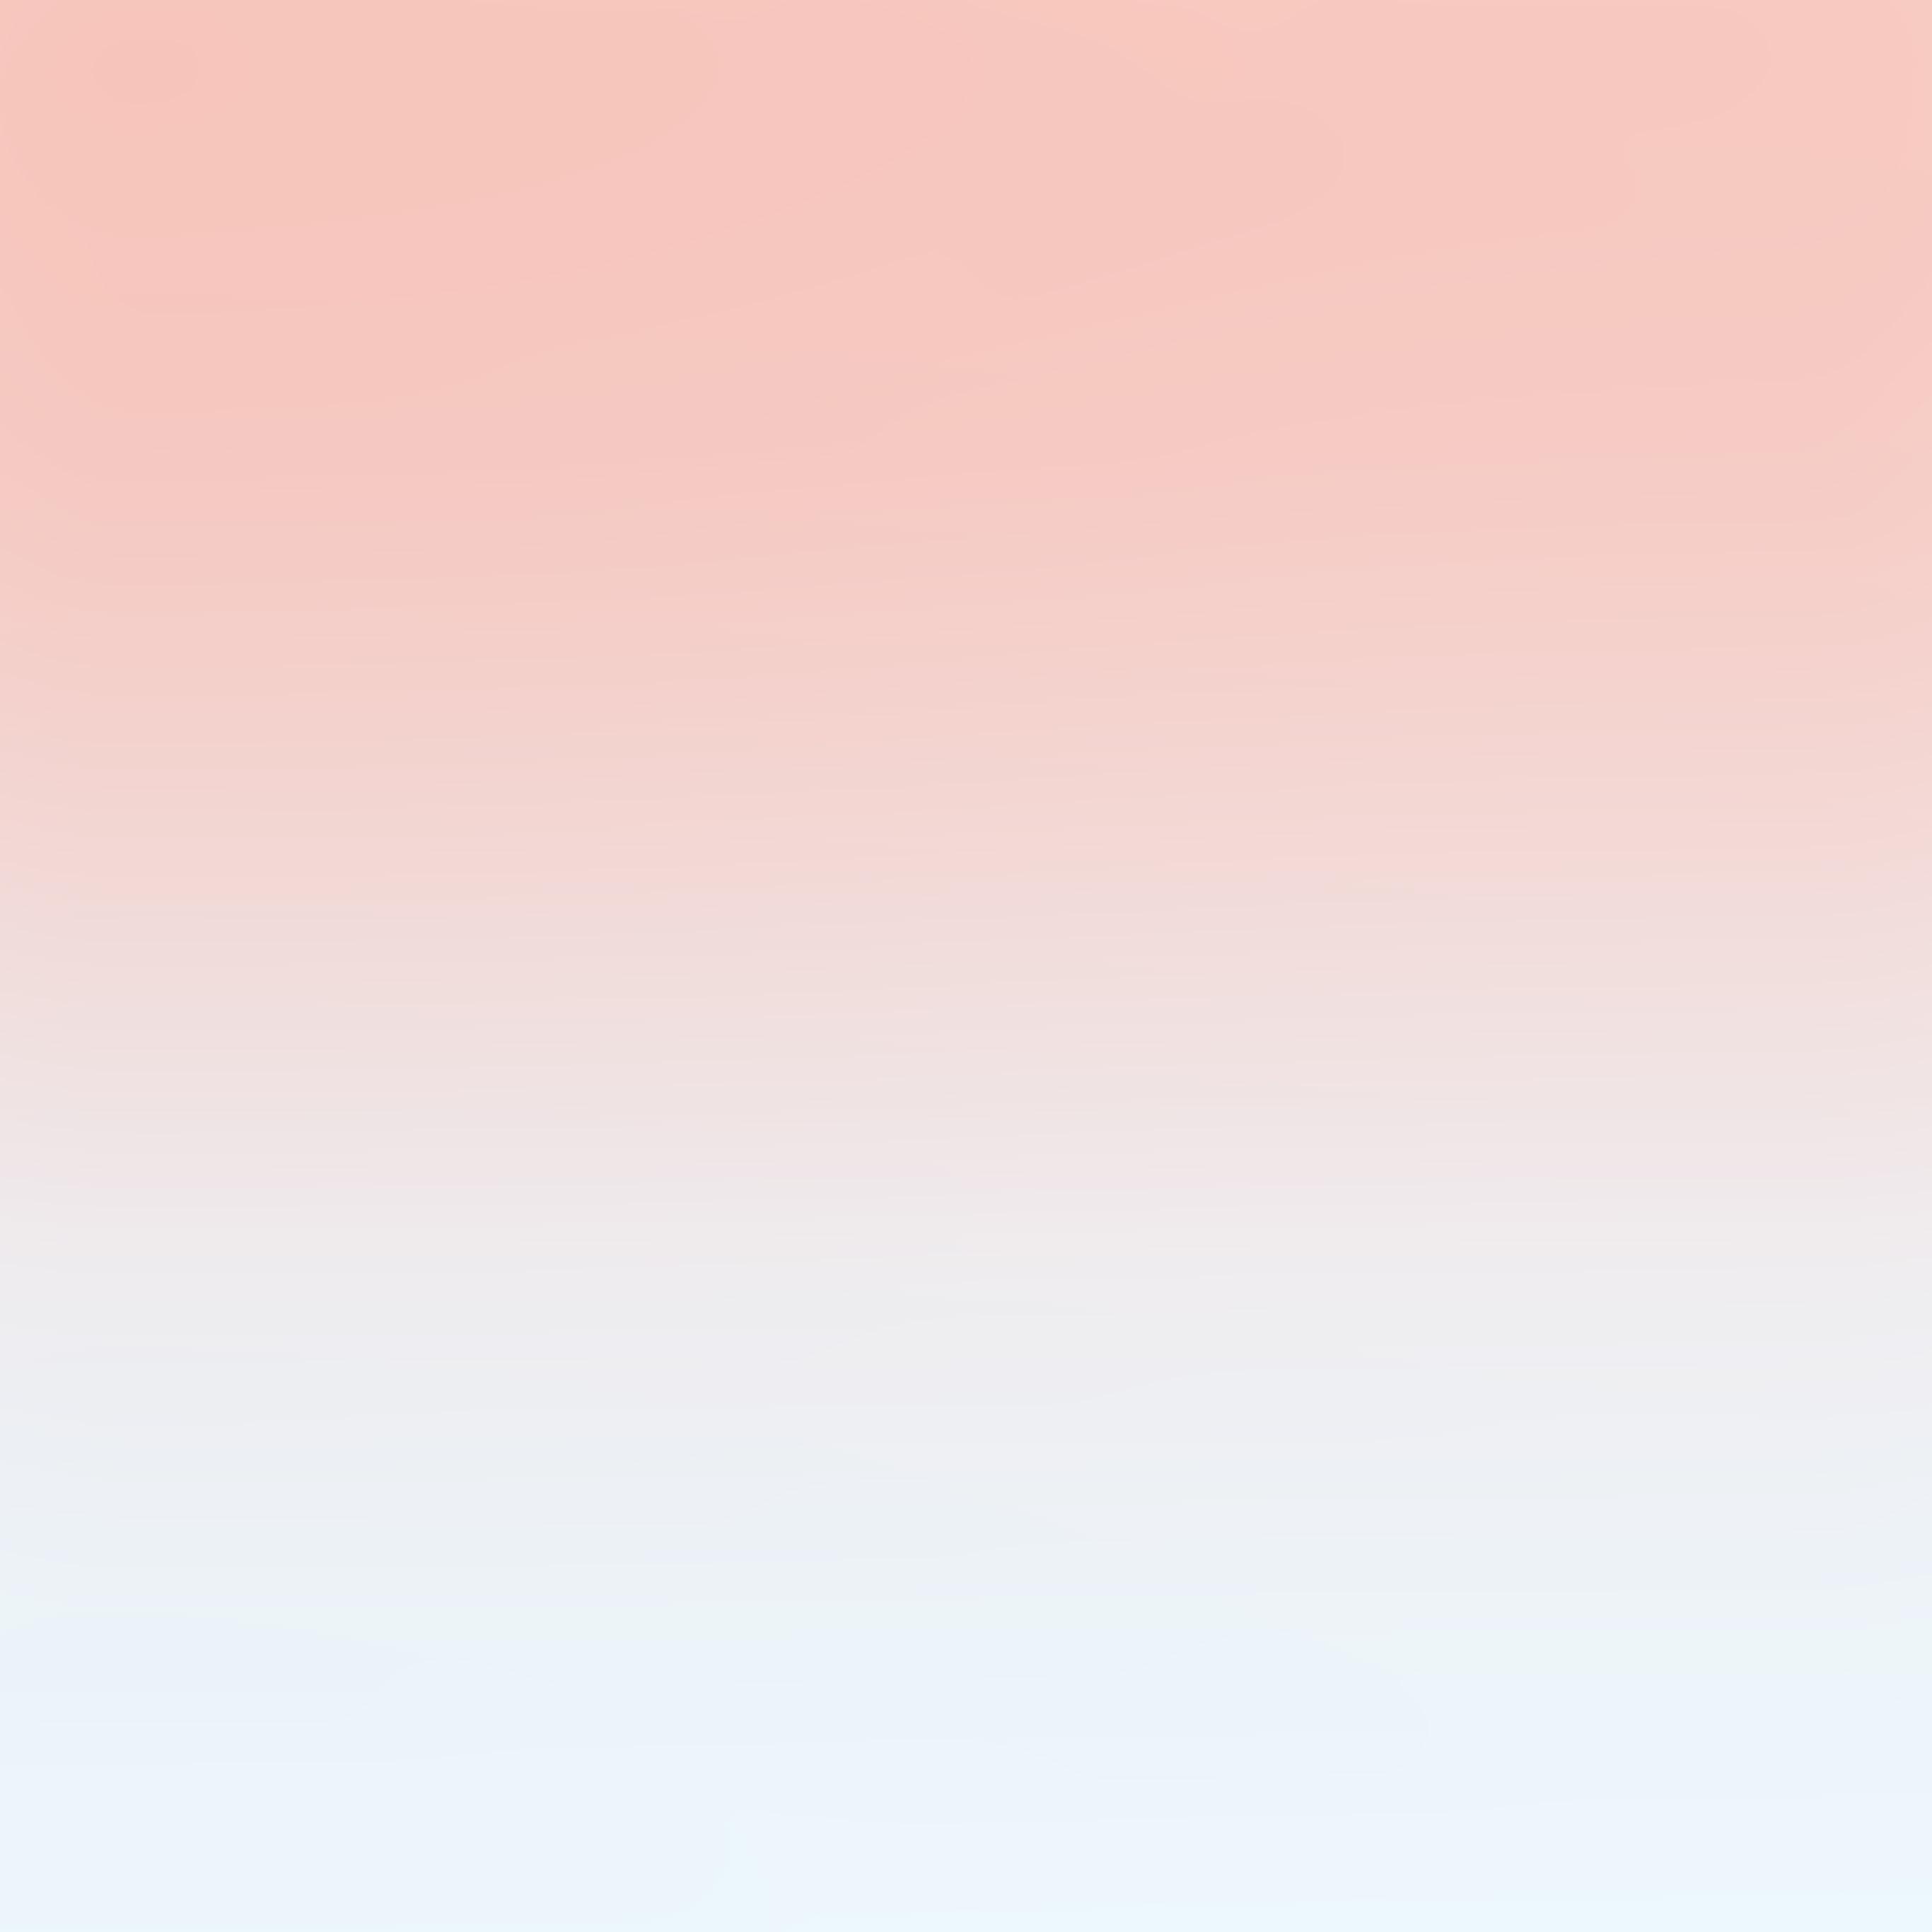 Wallpaper Cute Plain Sl97 Soft Pastel Red Blur Gradation Wallpaper